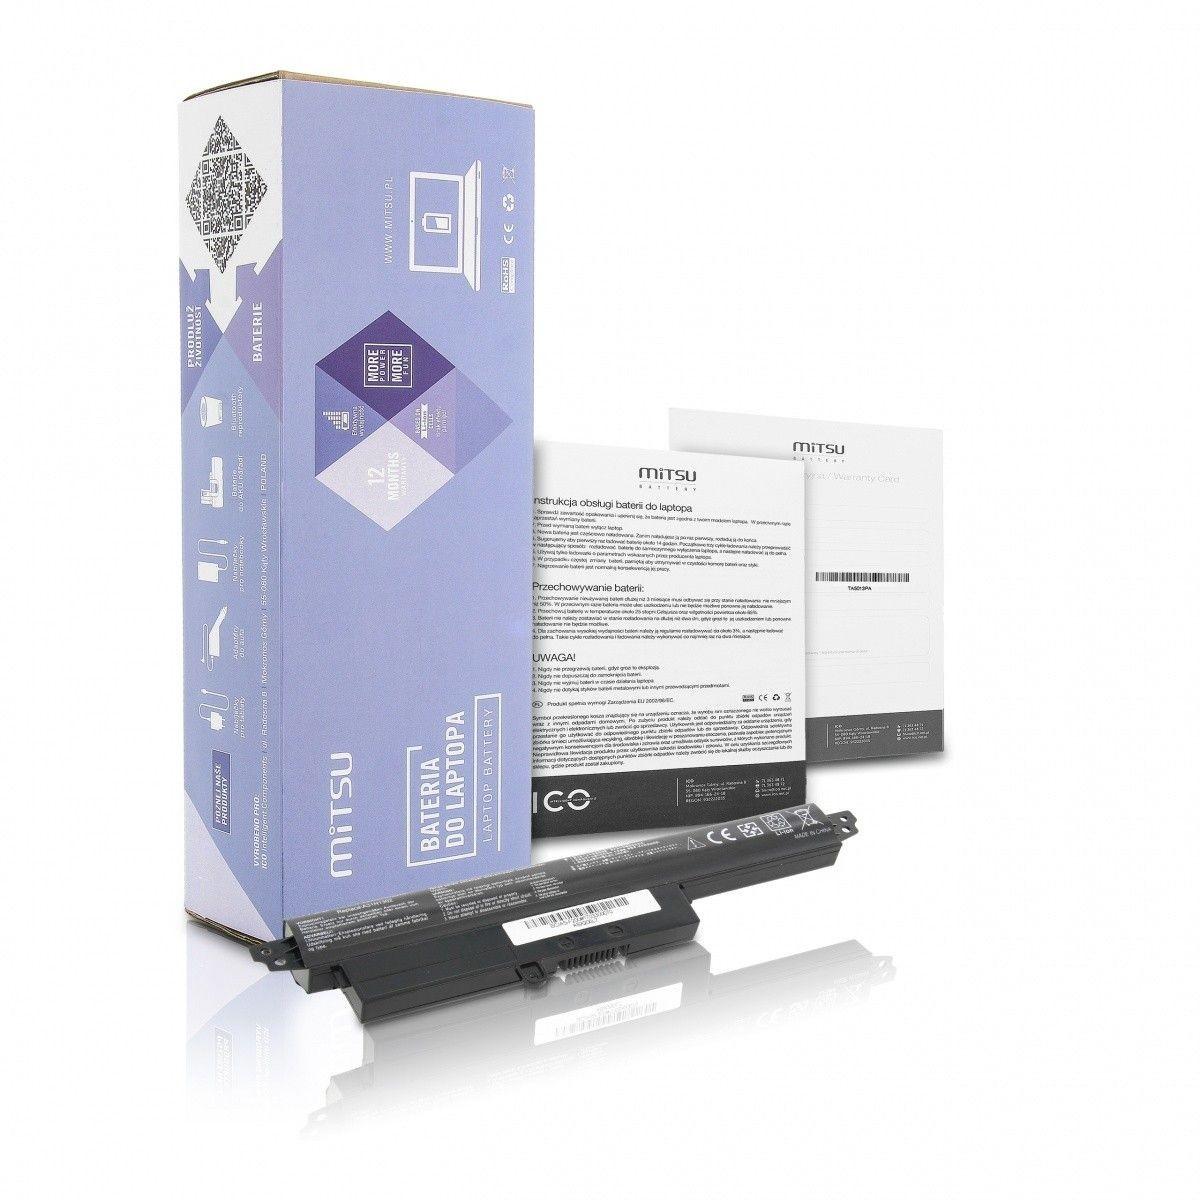 Mitsu Bateria do Asus Vivobook S200, X200 2200 mAh (24 Wh) 11.25 Volt